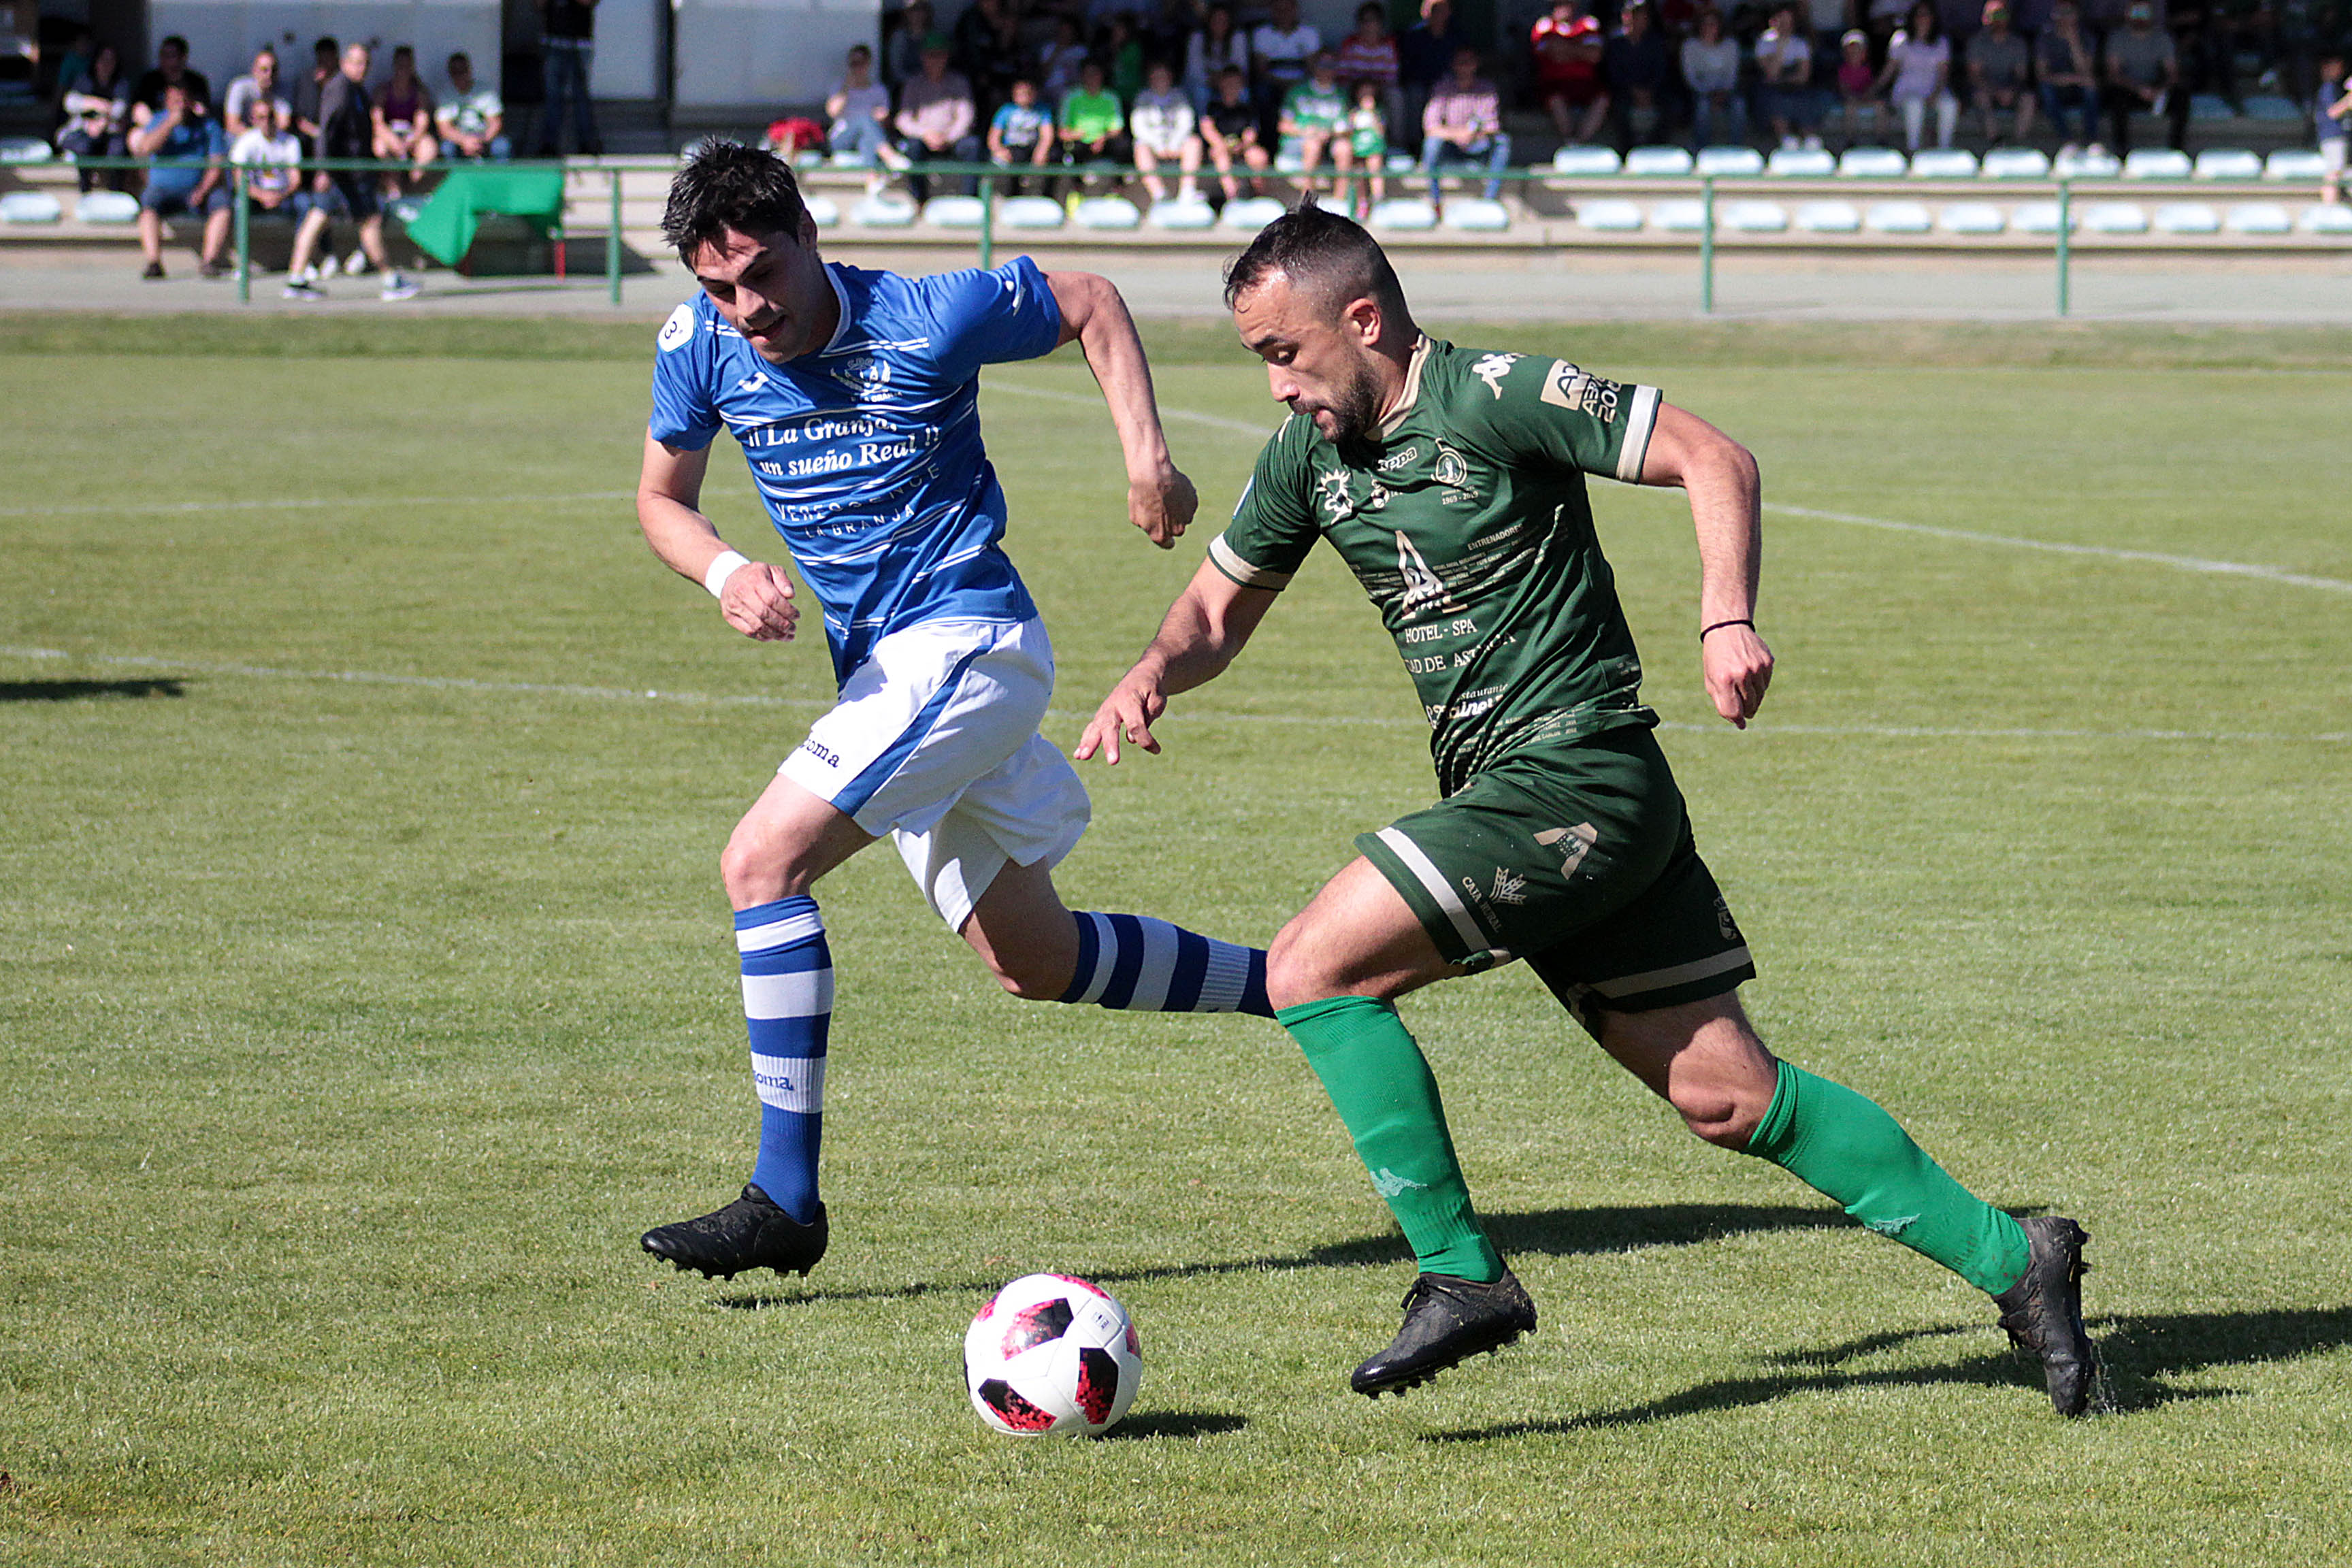 Triunfo del Atlético Astorga ante La Granja